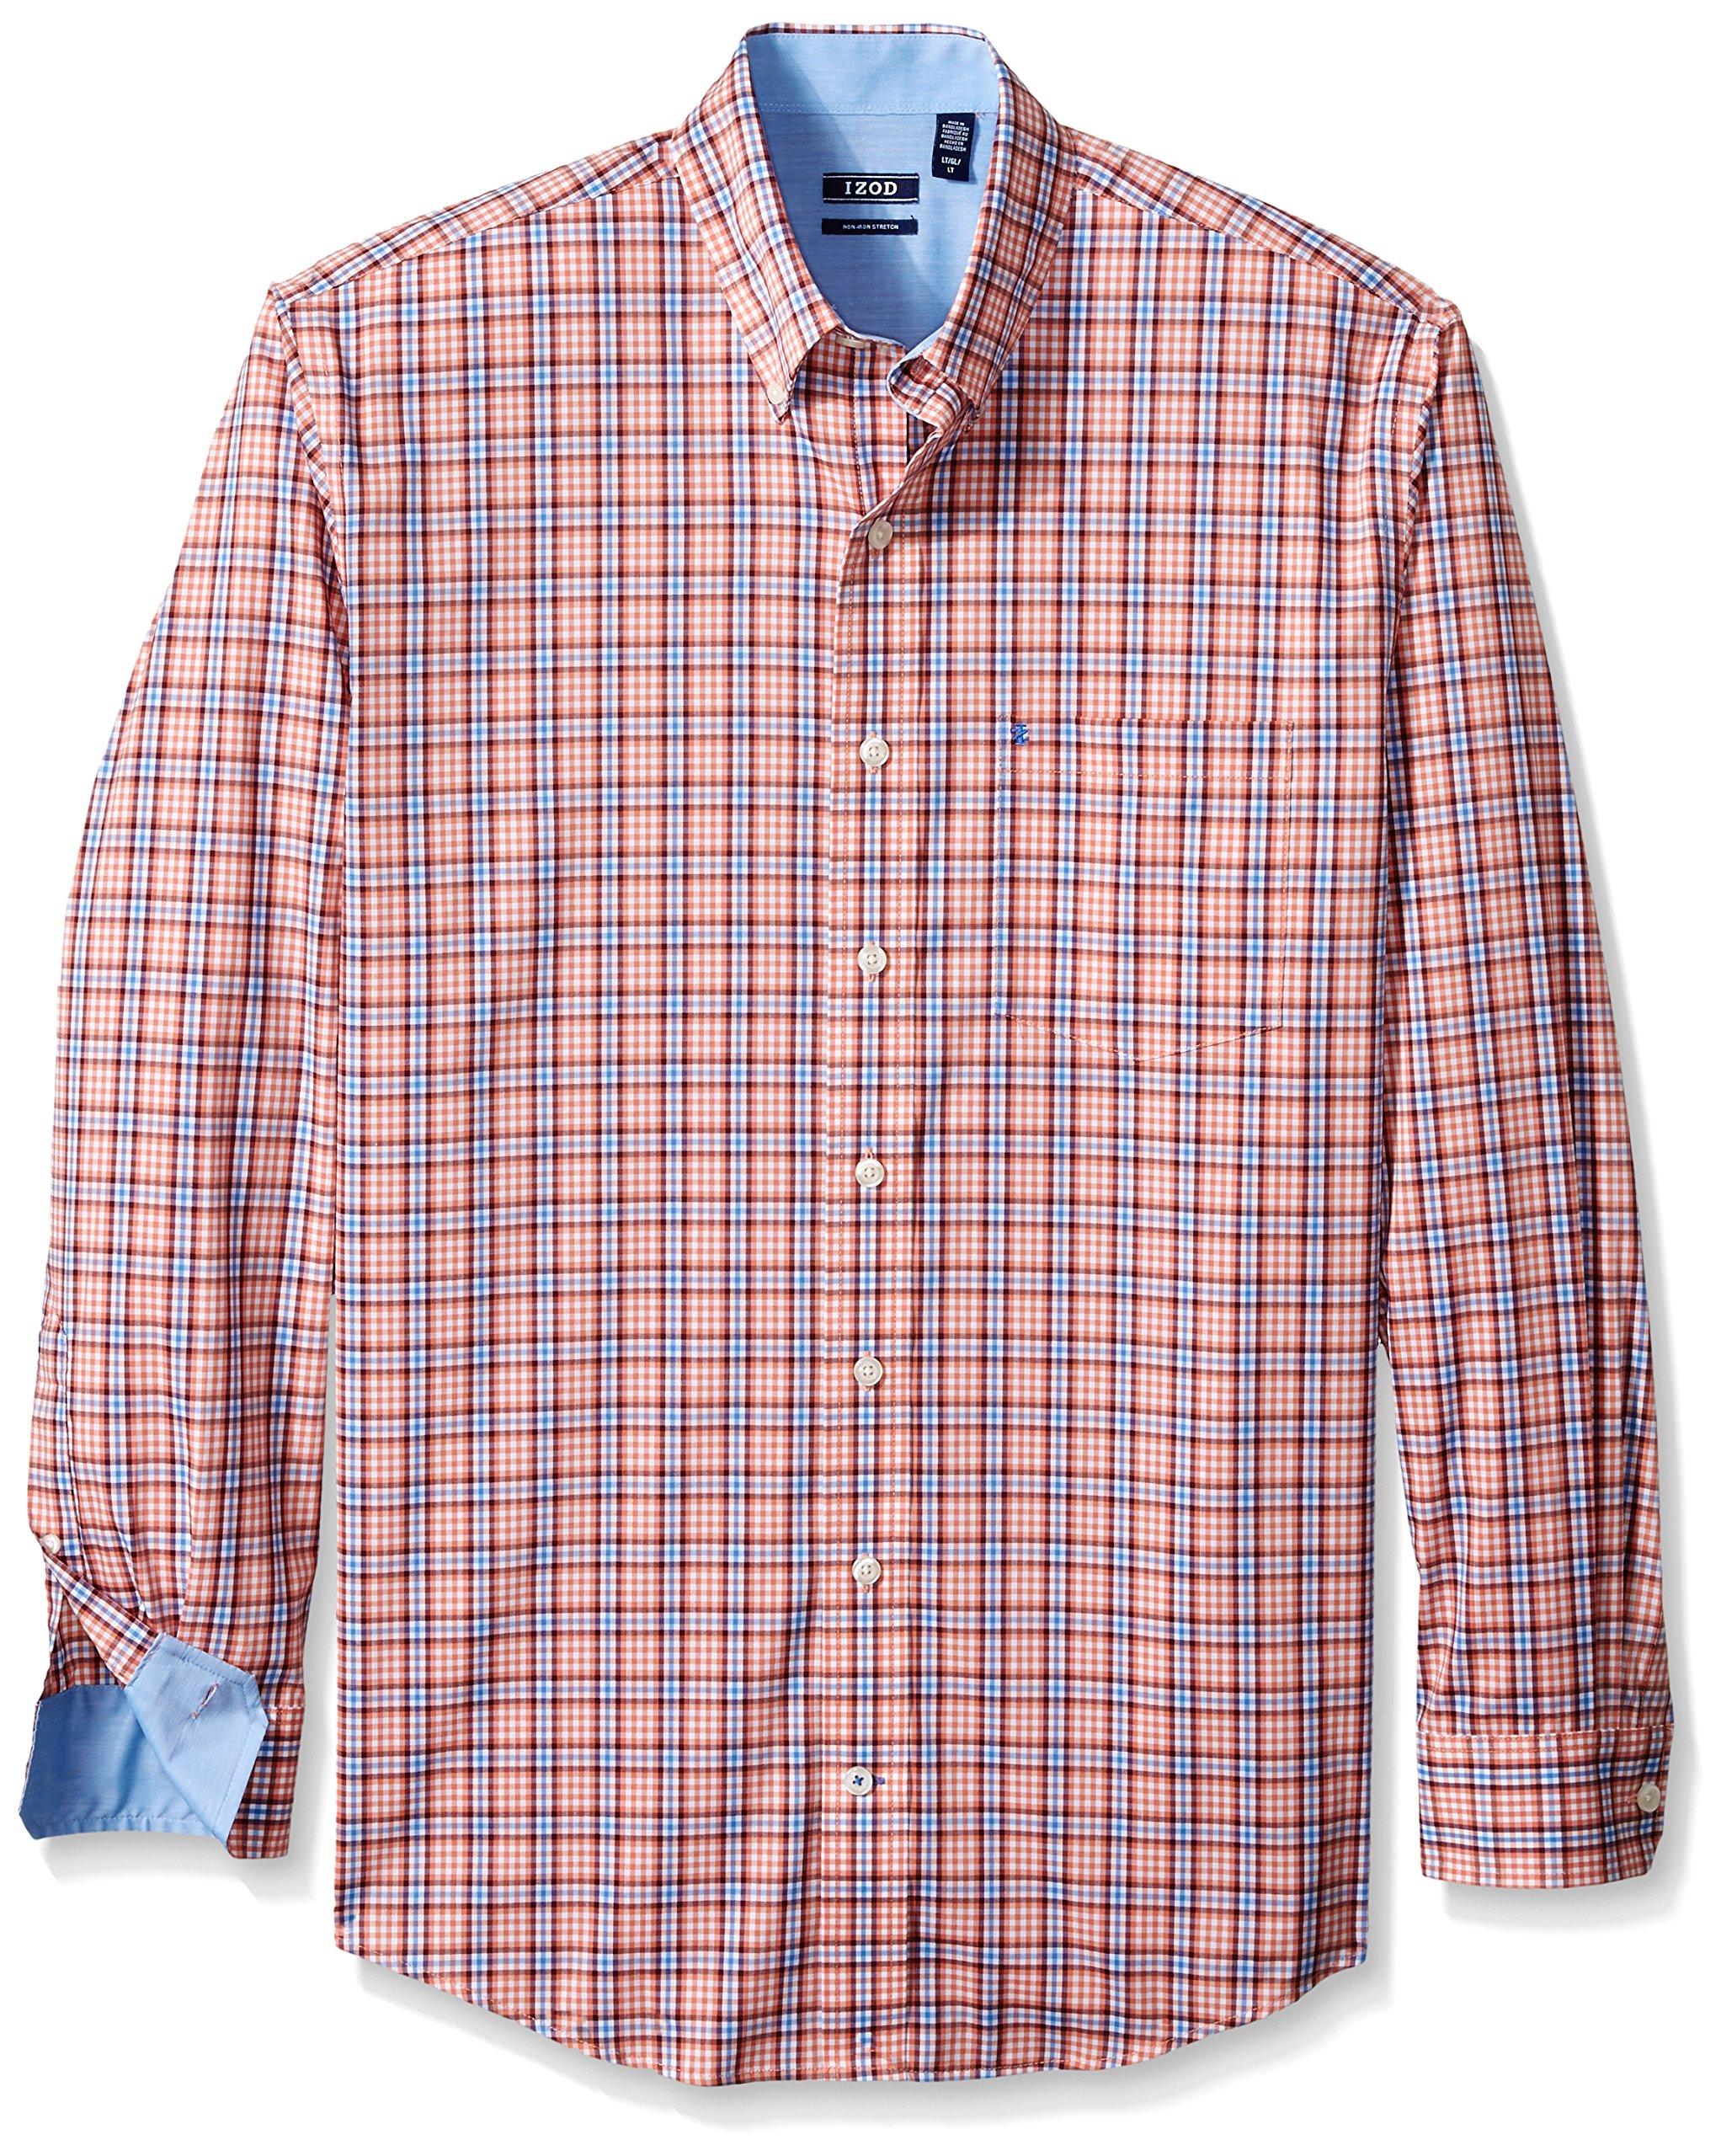 IZOD Men's Big and Tall Advantage Performance Stretch Long Sleeve Shirt, Tawny Orange, 2X-Large Tall